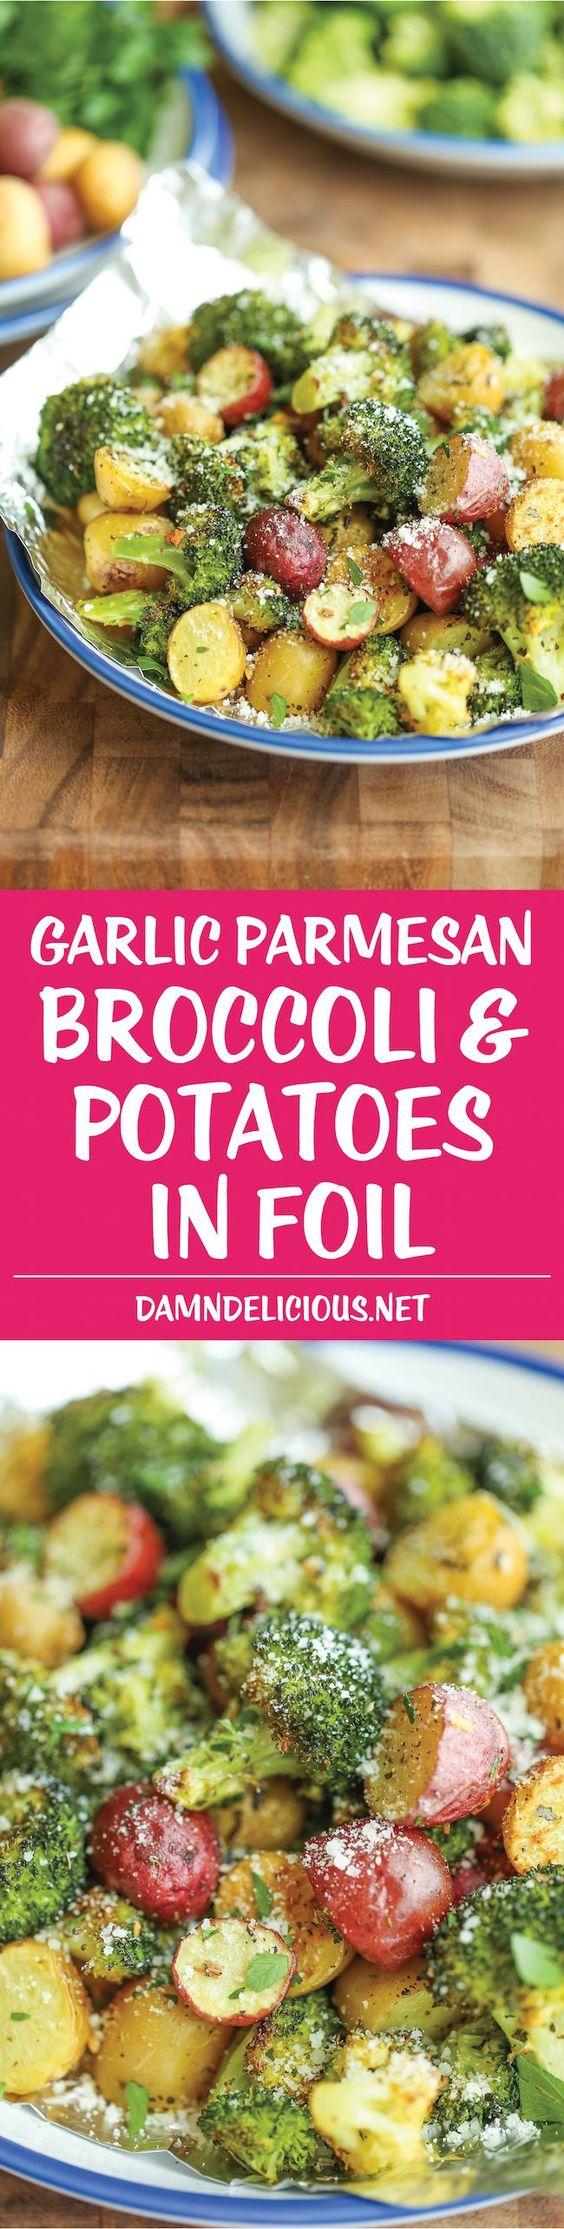 Garlic Parmesan Broccoli and Potatoes in Foil Recipe Parmesan